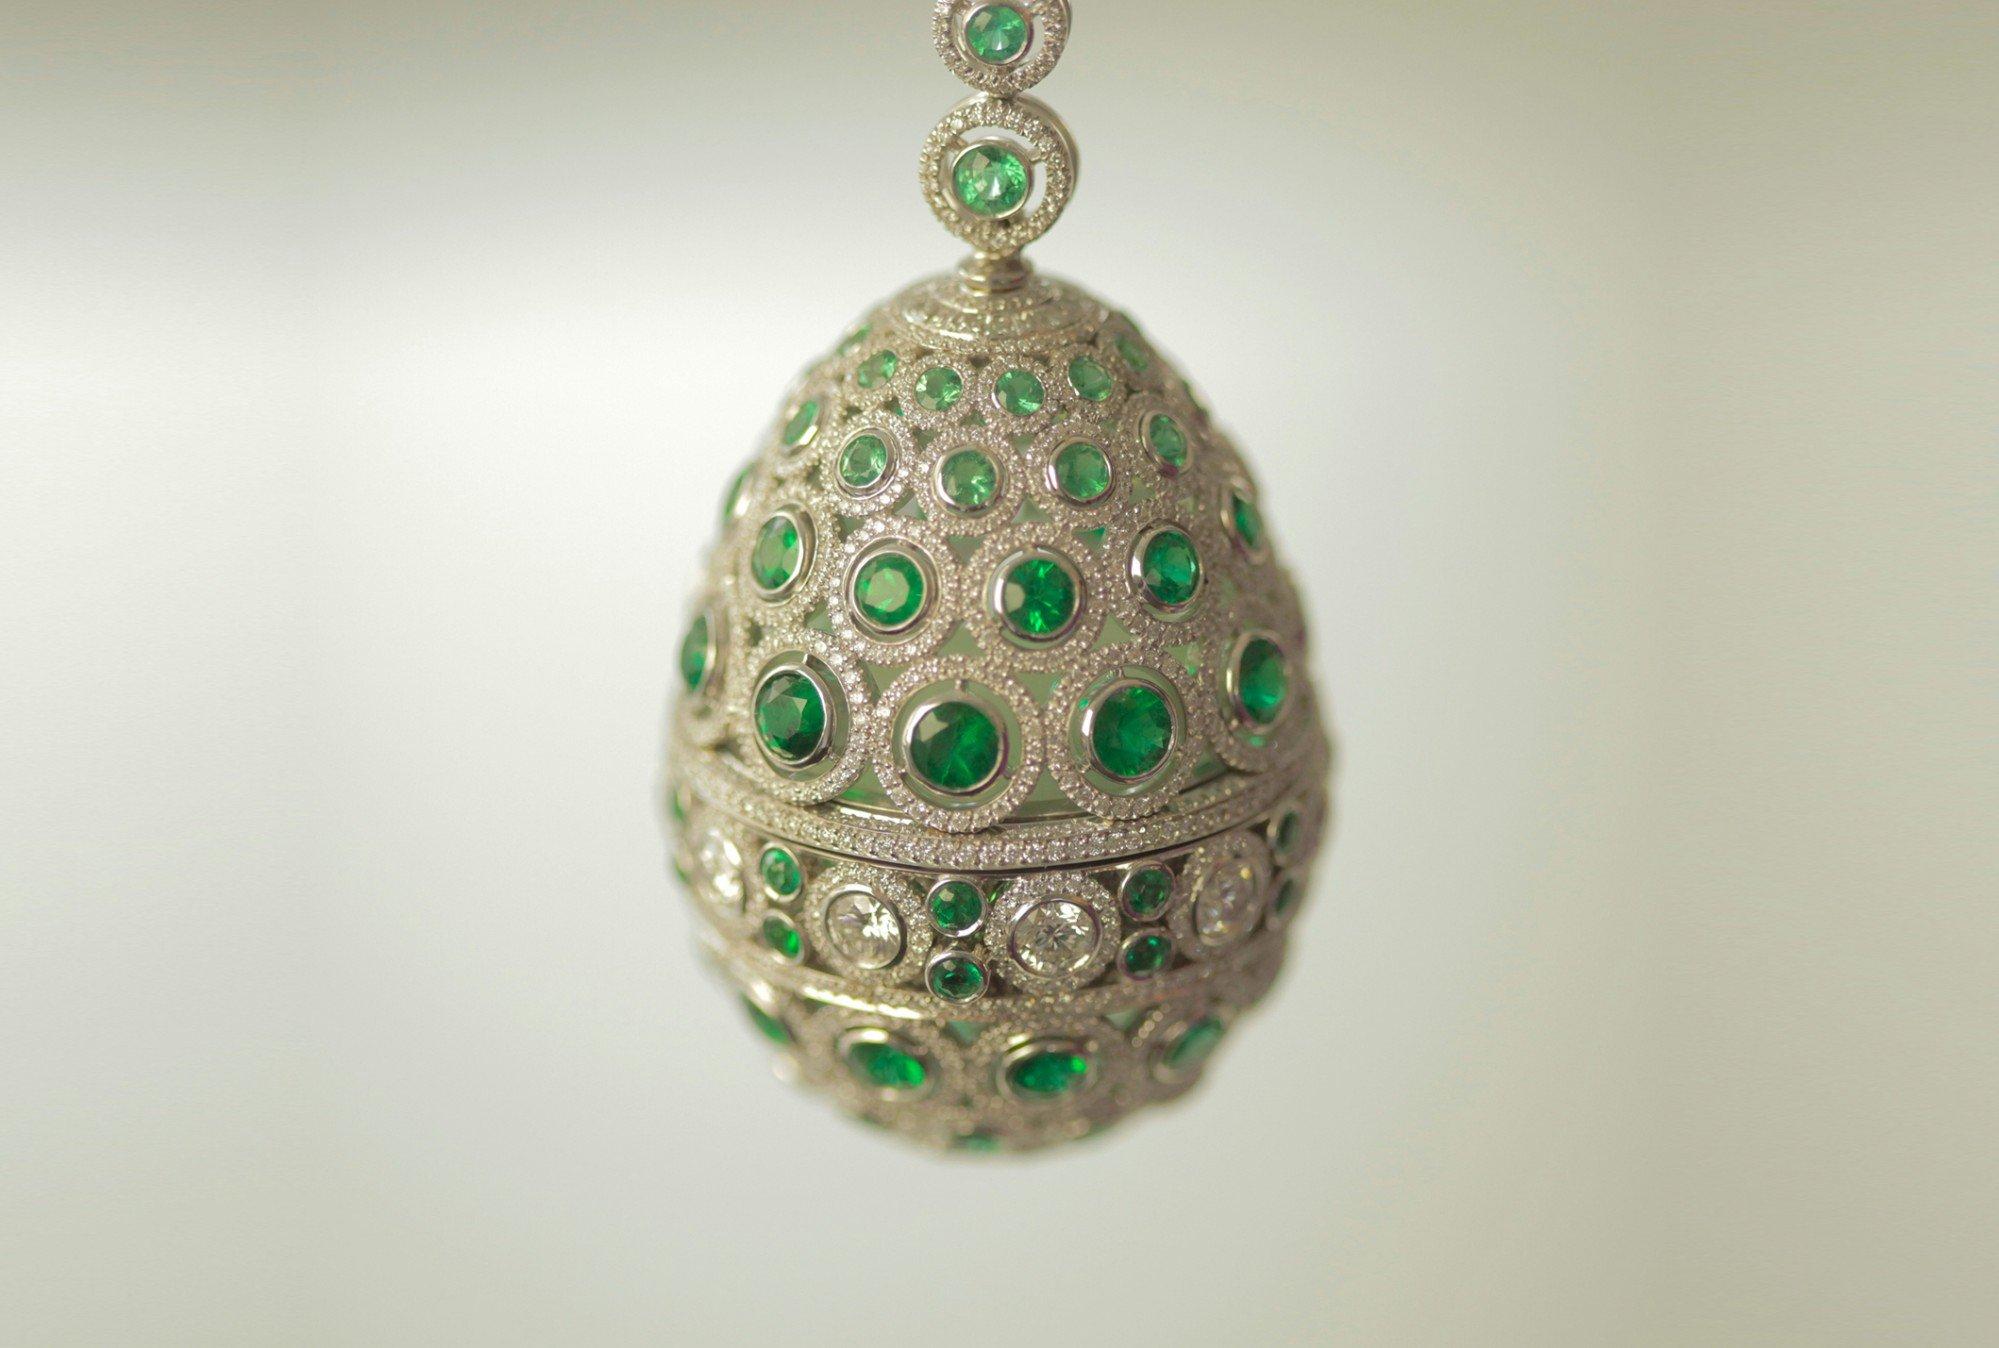 The Emerald Diaghilev Egg, Fabergé, 2014